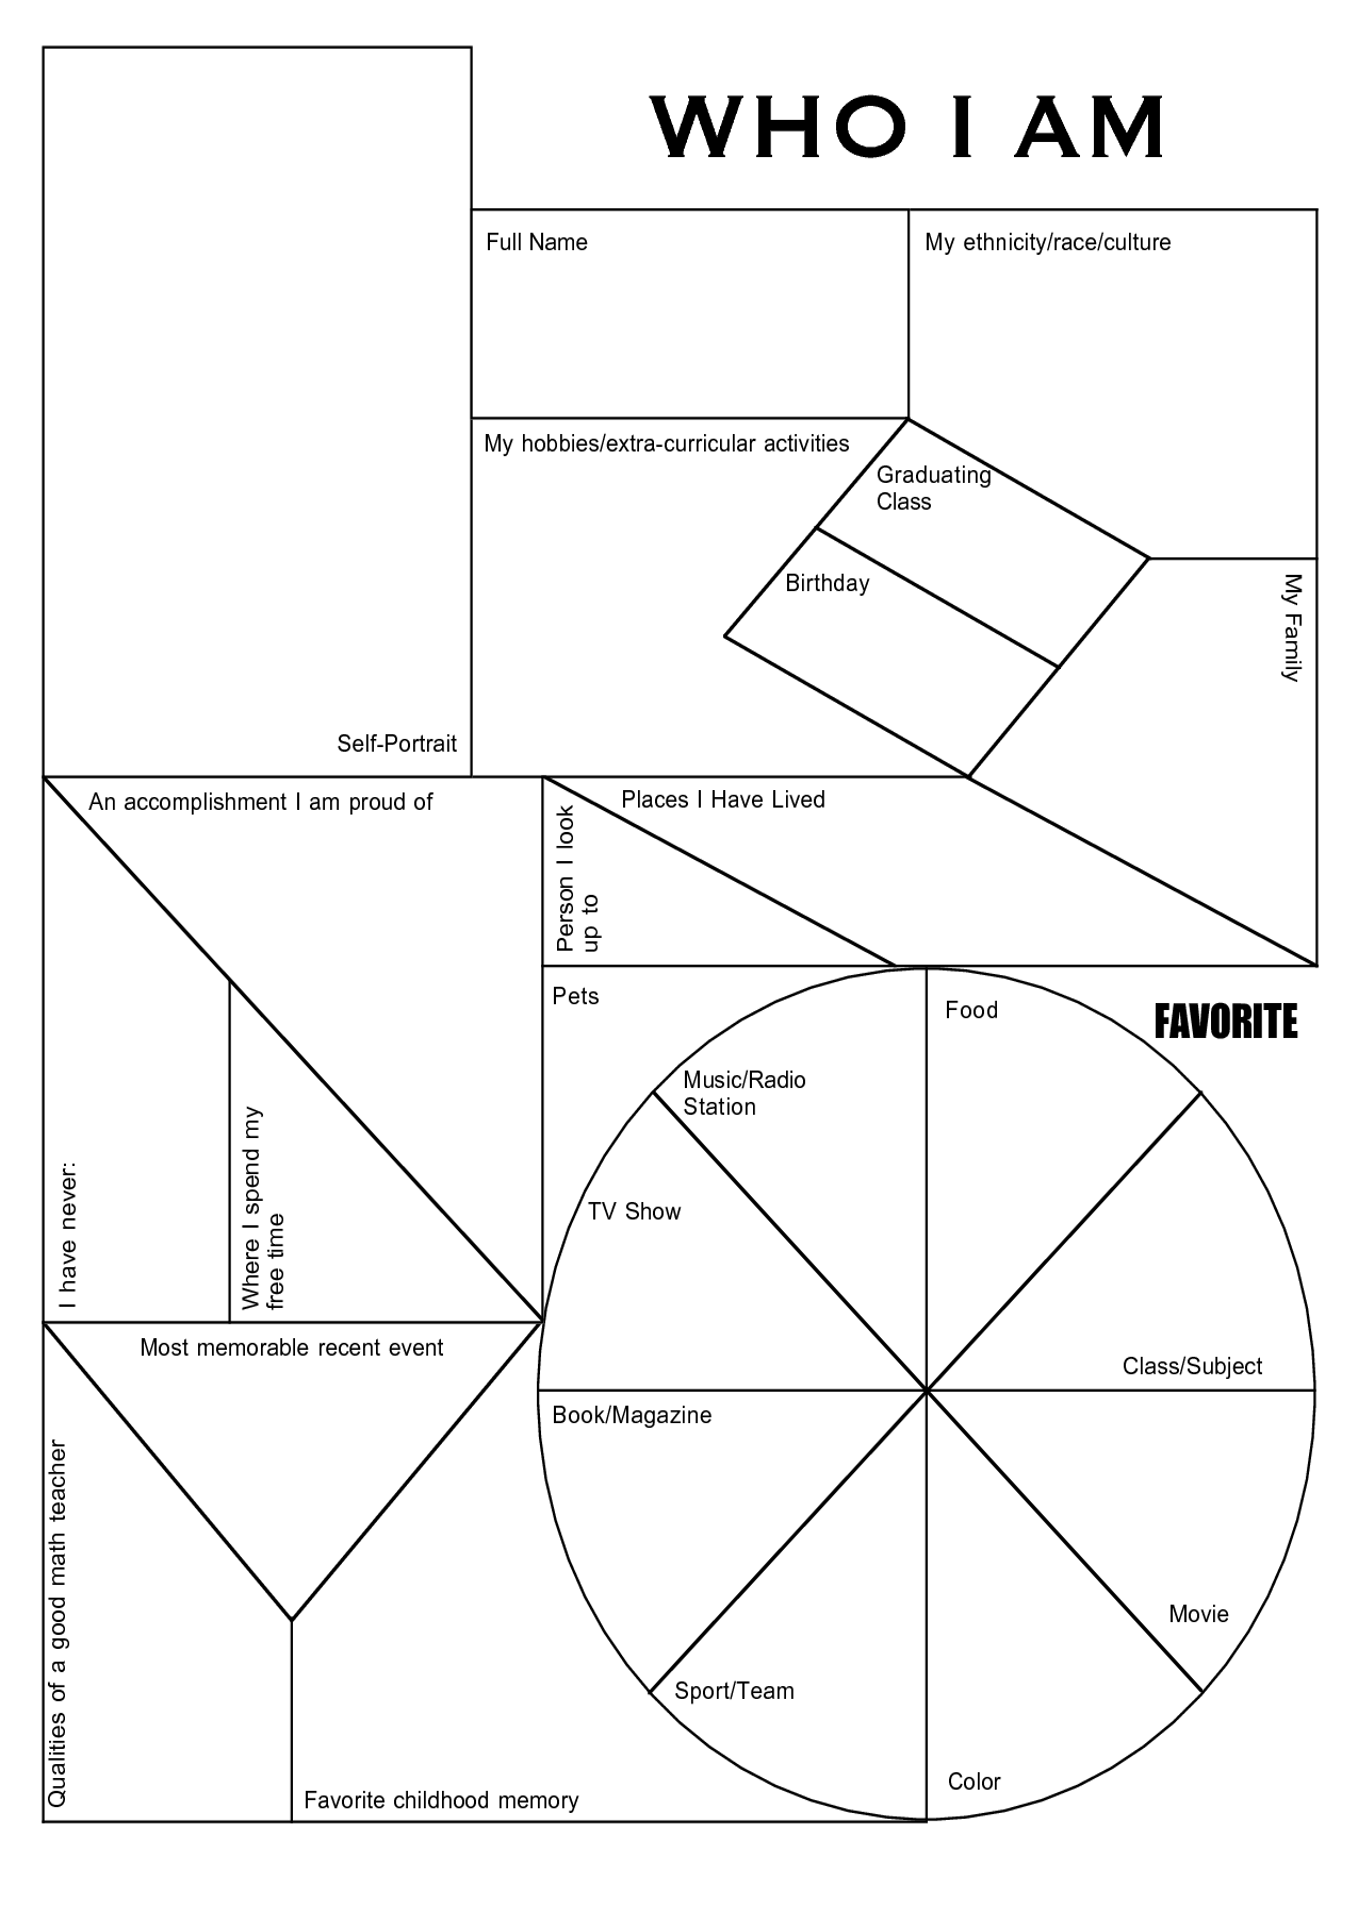 Printable High School Student Survey